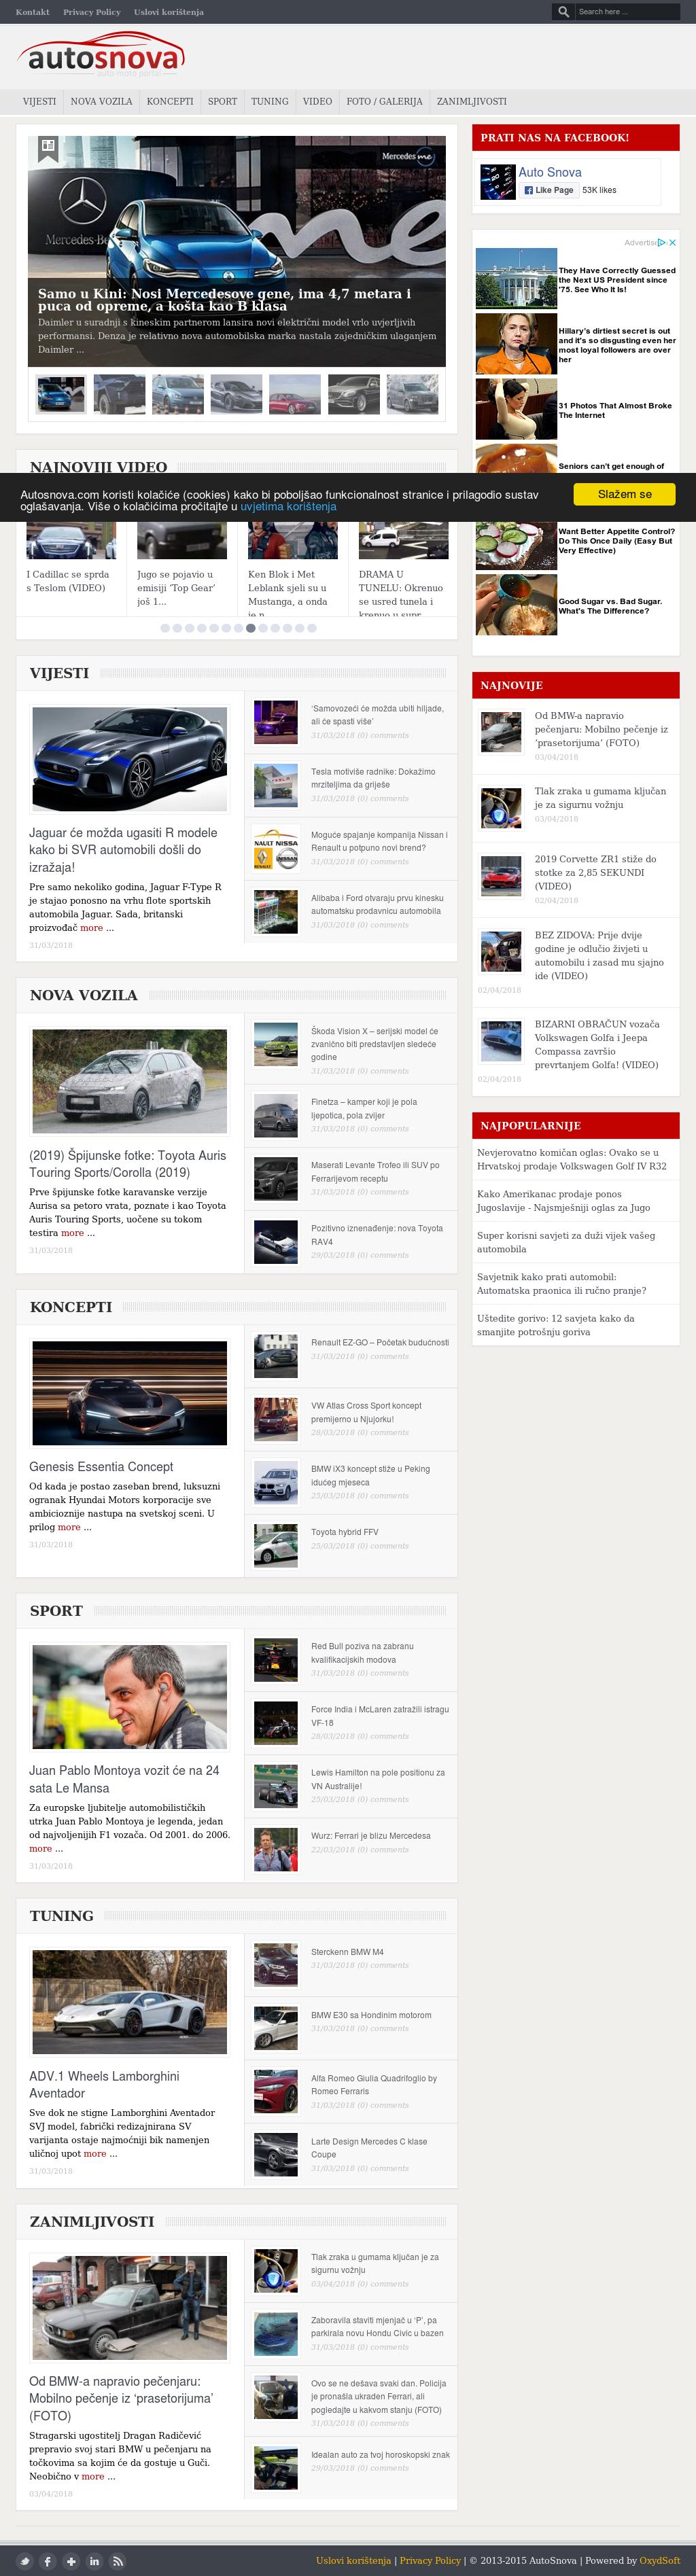 Auto Snova petitors Revenue and Employees Owler pany Profile